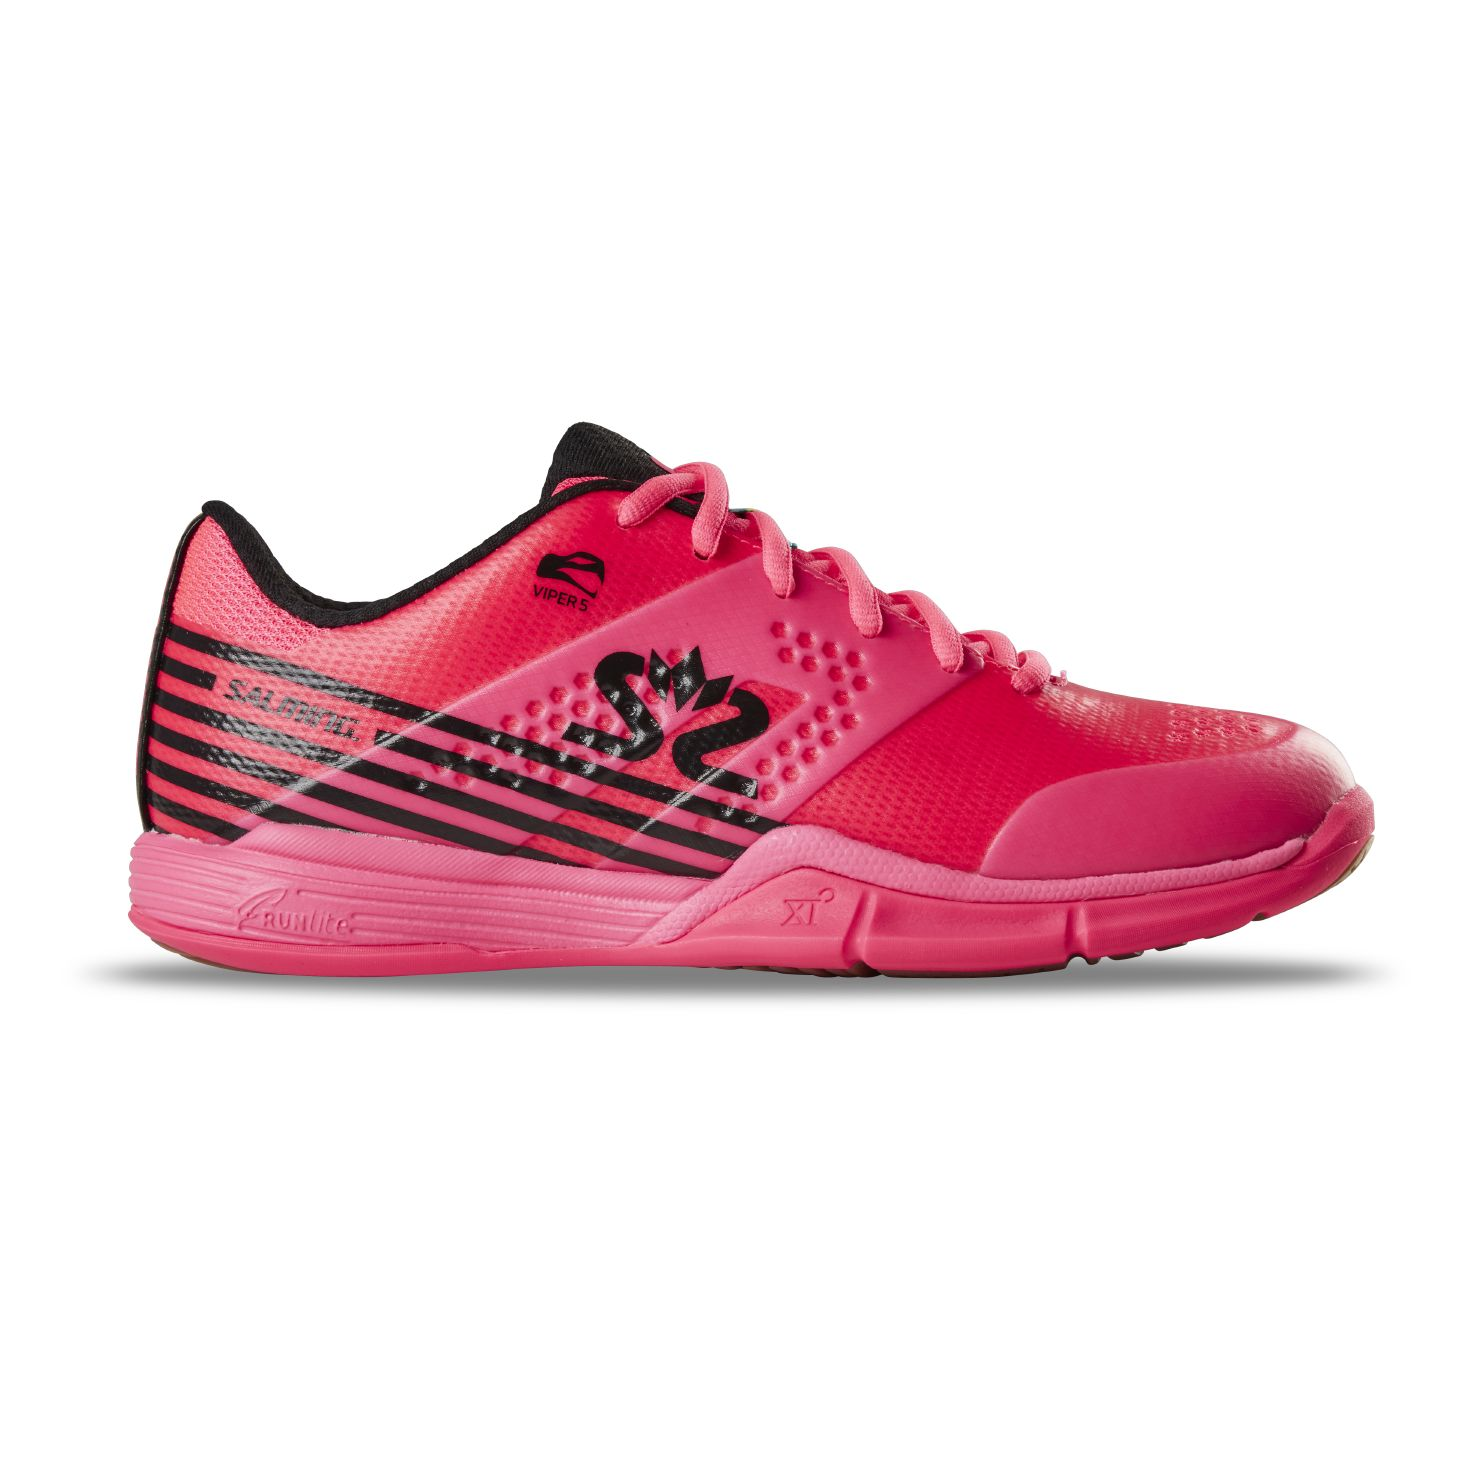 Salming Viper 5 Shoe Women Pink/Black 8,5 UK - 42 2/3 EUR - 27,5 cm